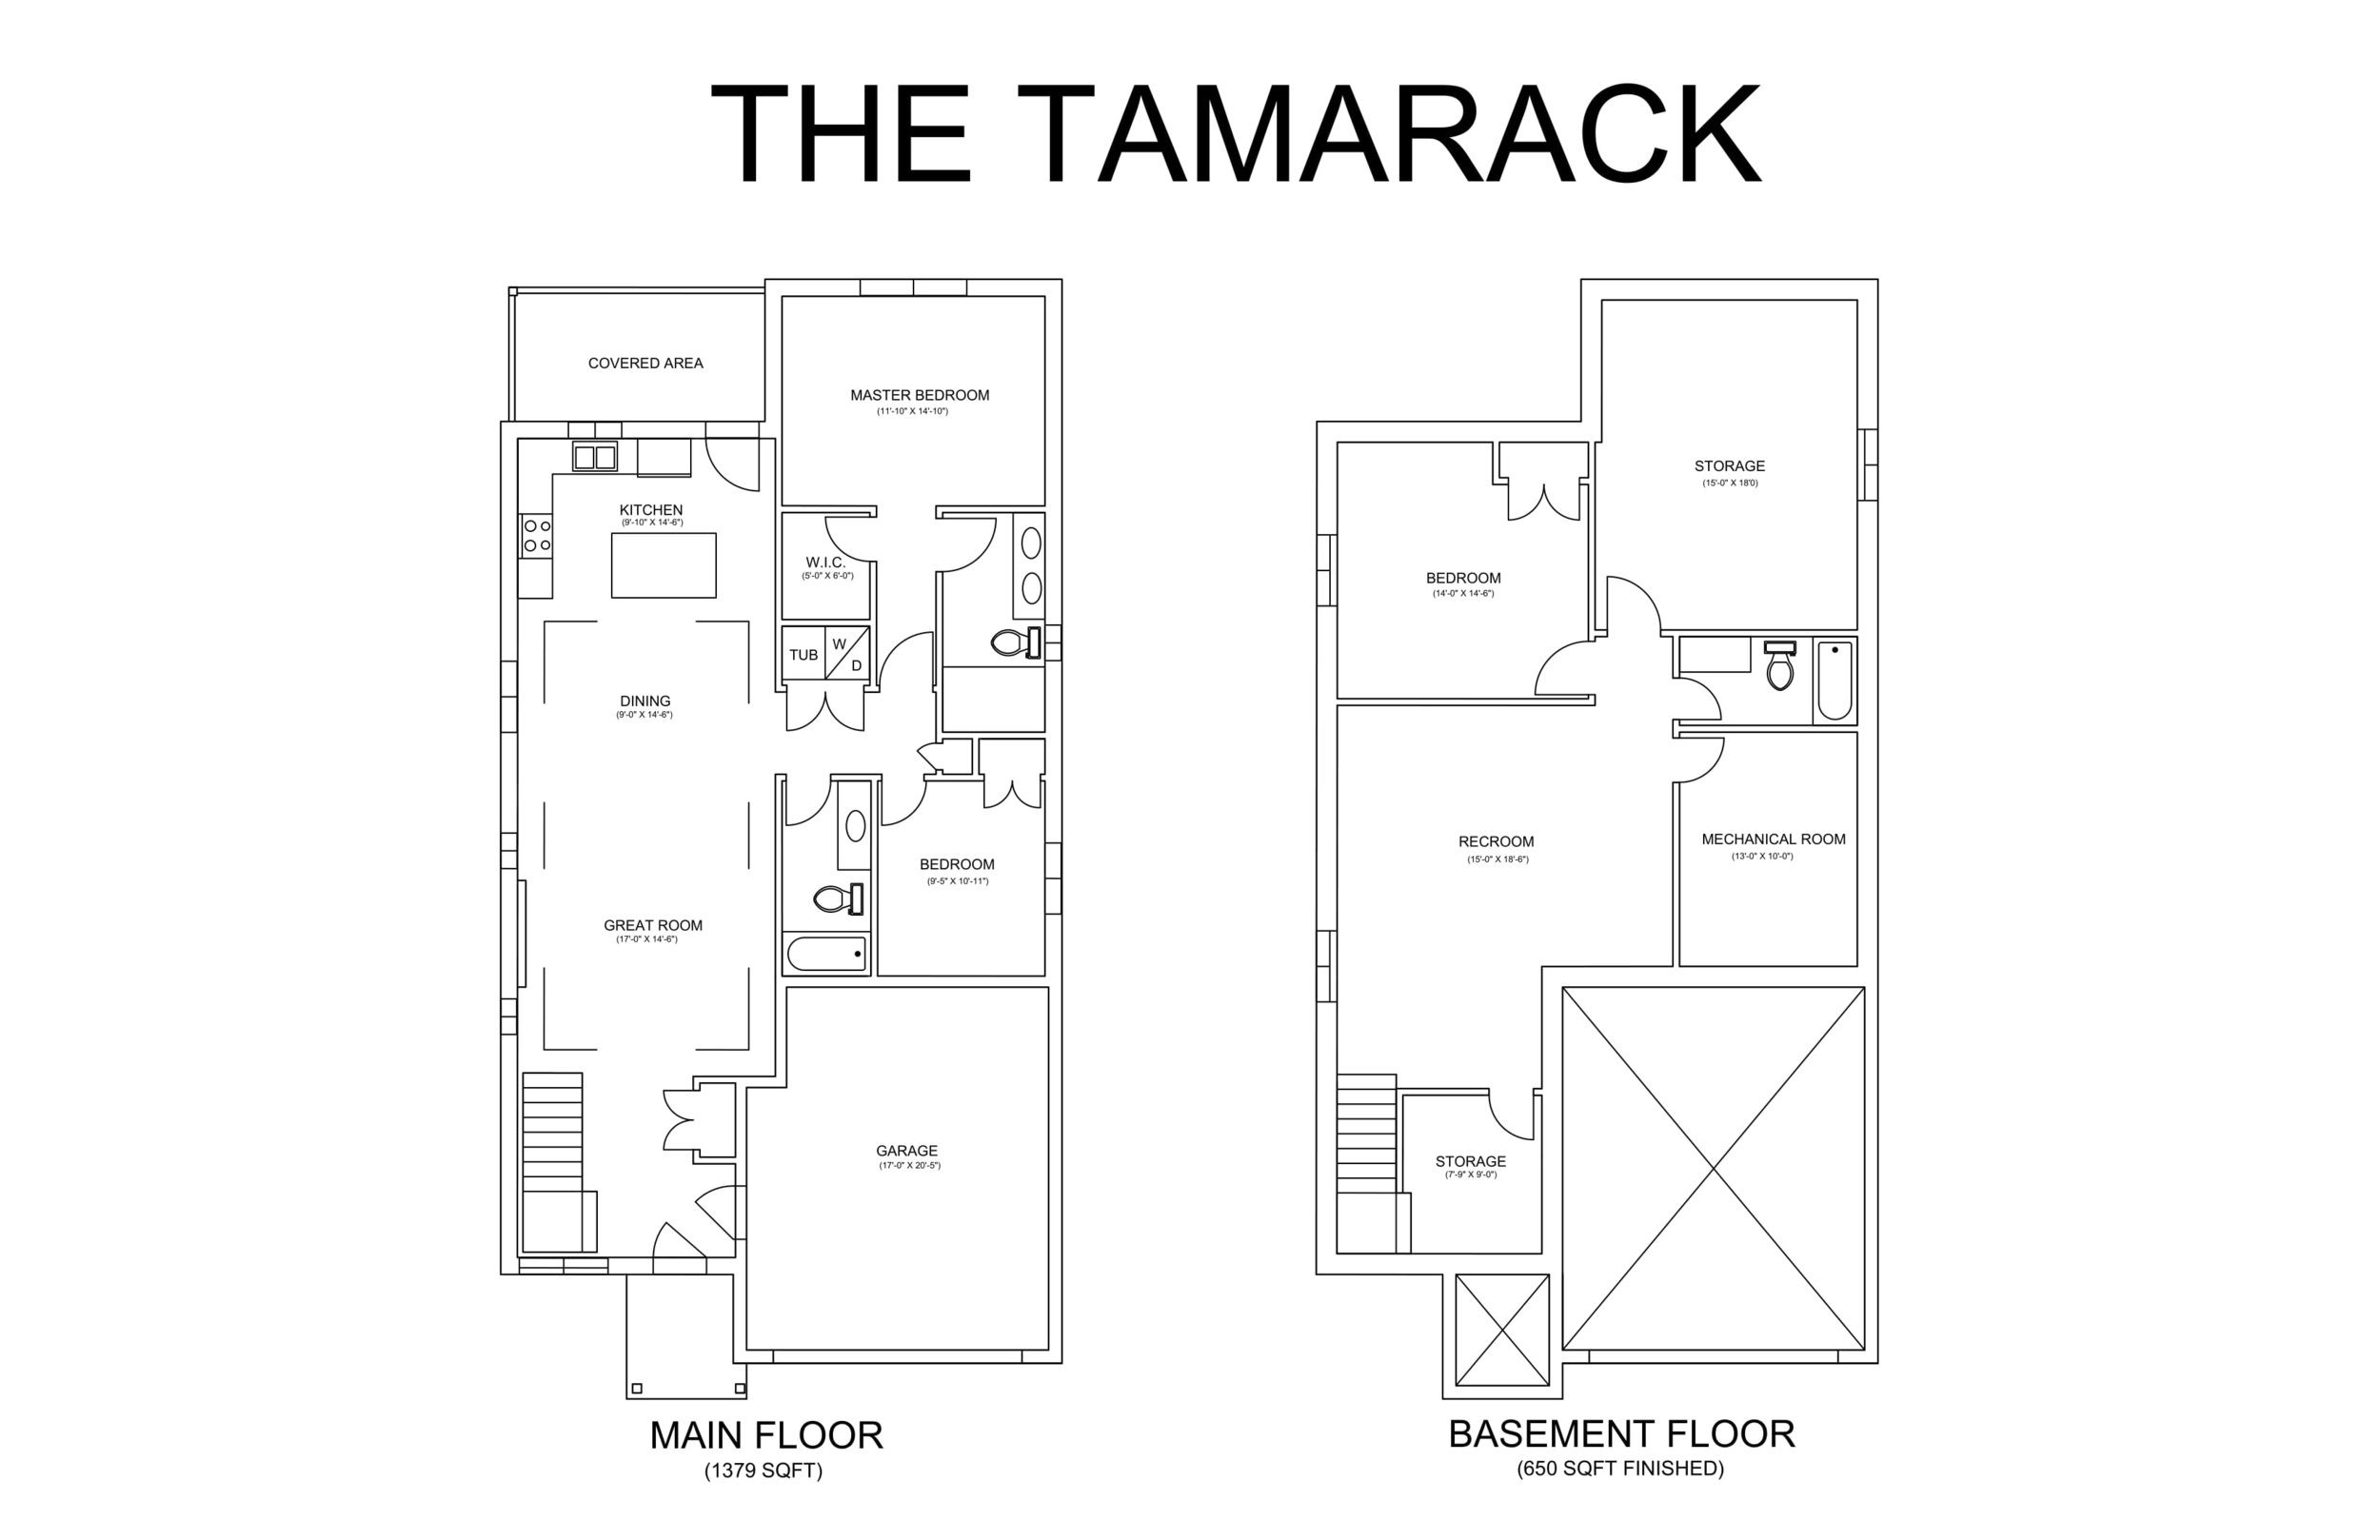 Southgrove model TAMARACK CLEAN-Layout1-1.jpg